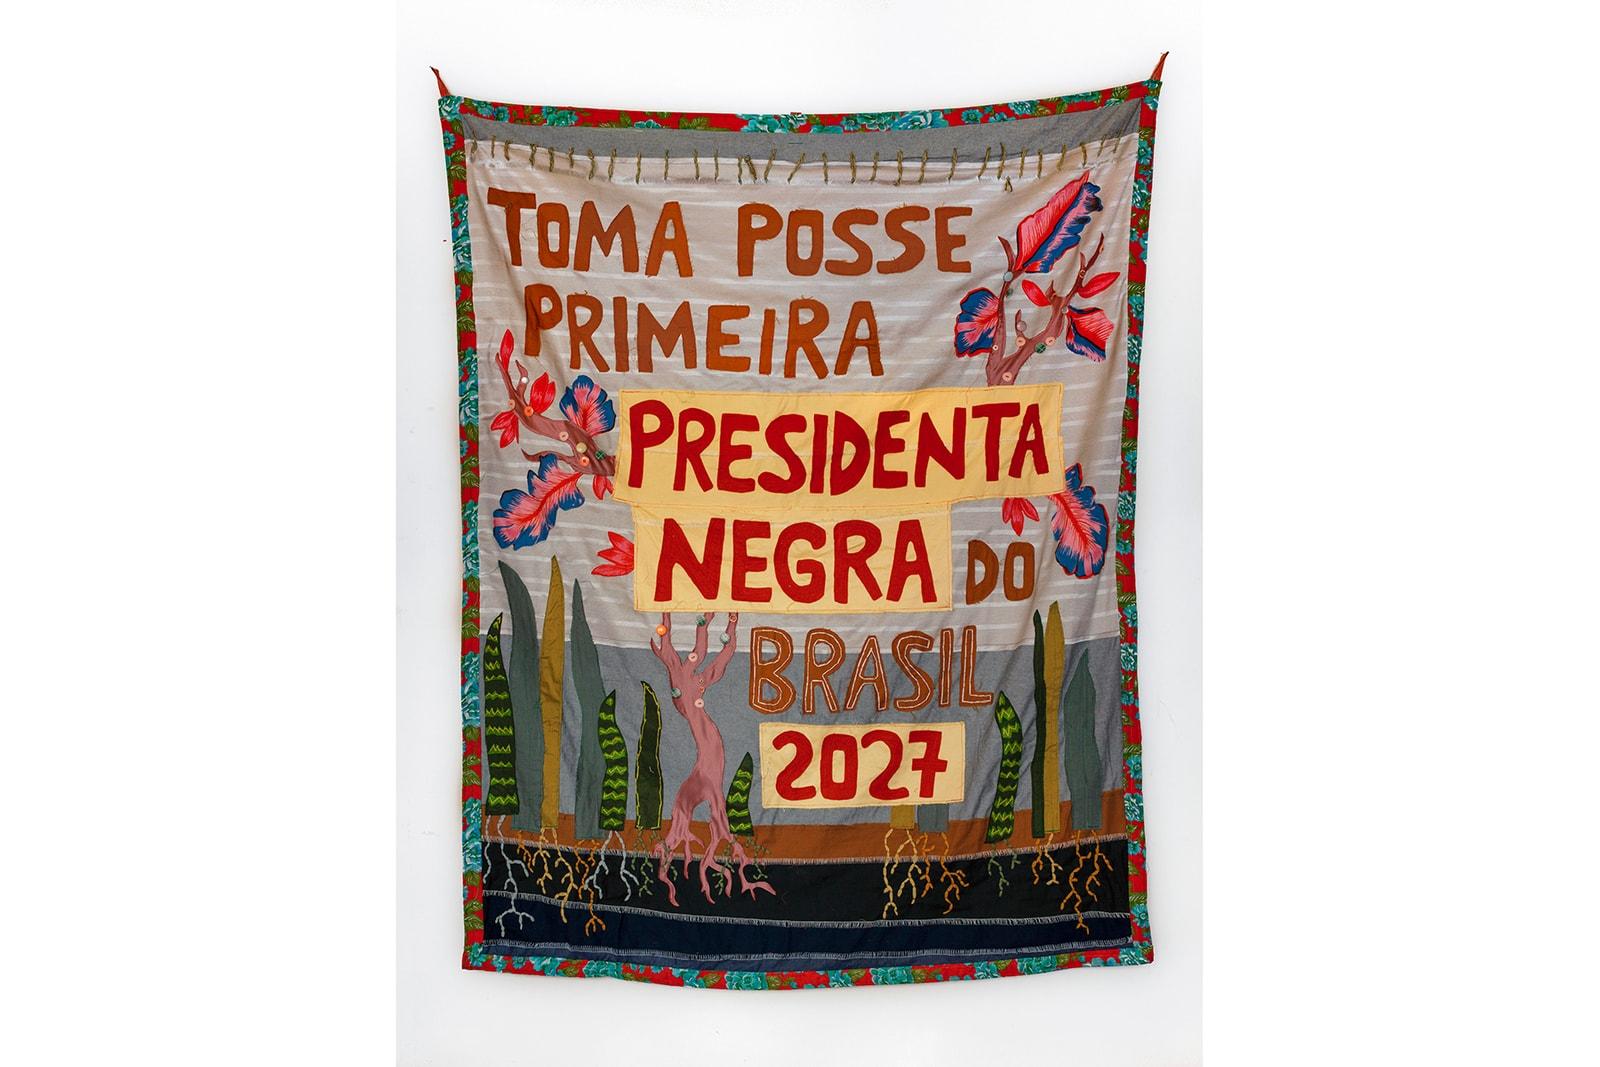 SP-Arte 2019 Focuses on Latin American Identity | HYPEBEAST